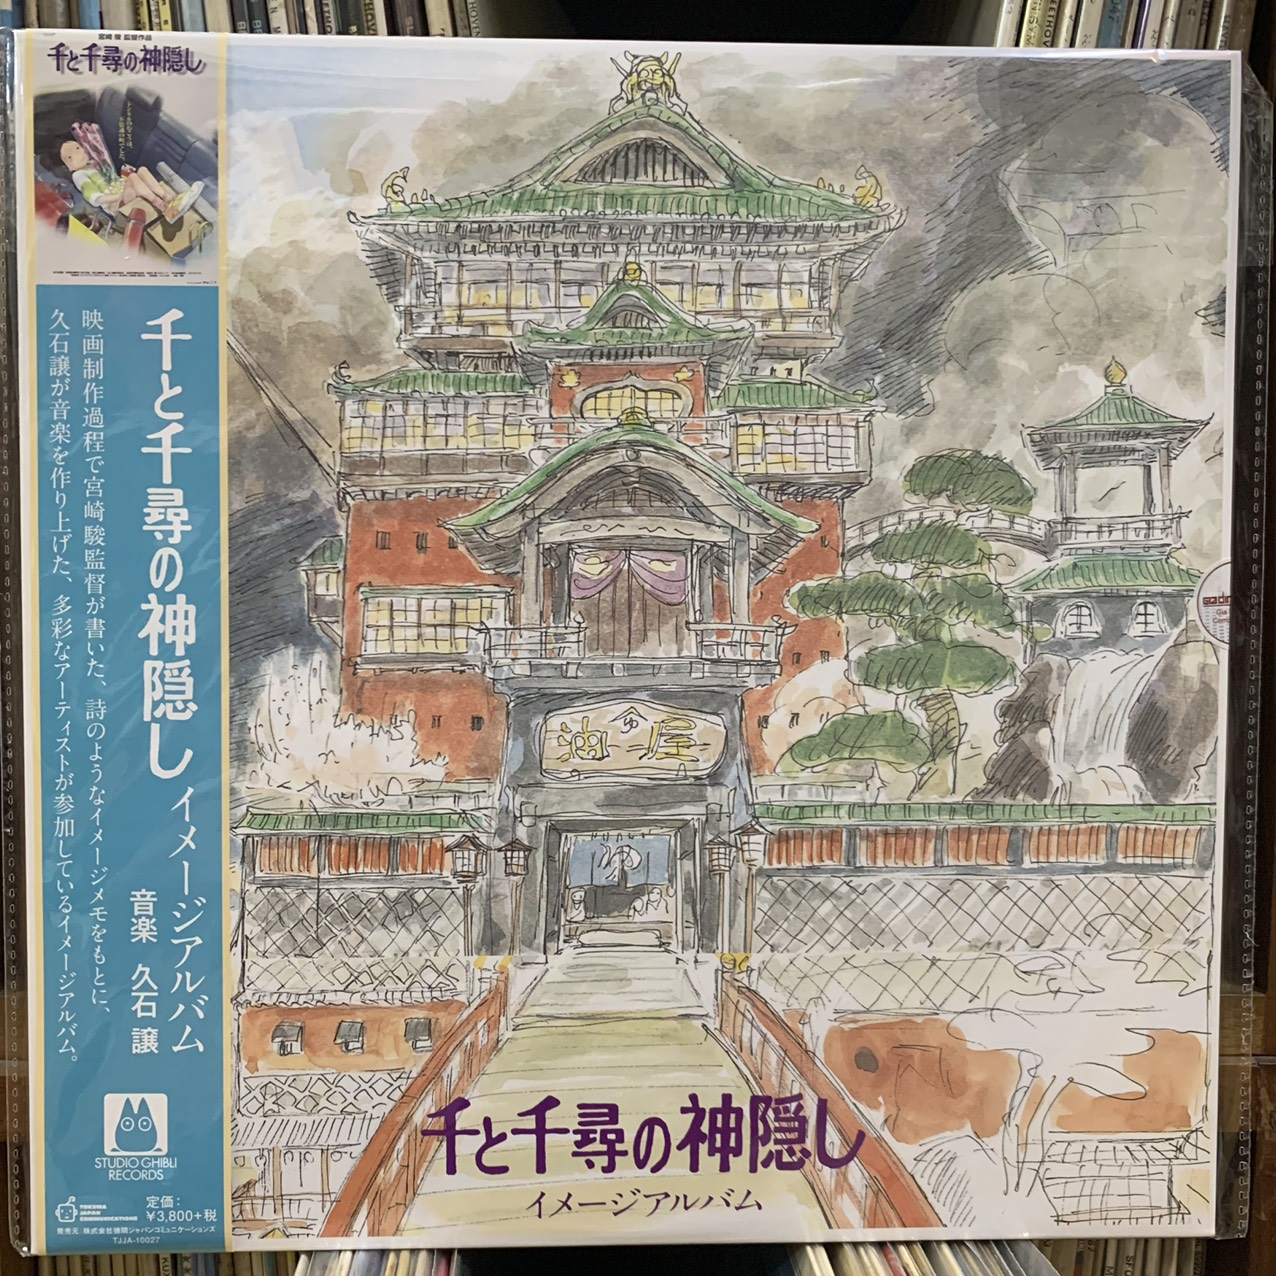 dia-than-lp-vung-dat-linh-hon-image-album-studio-ghibli